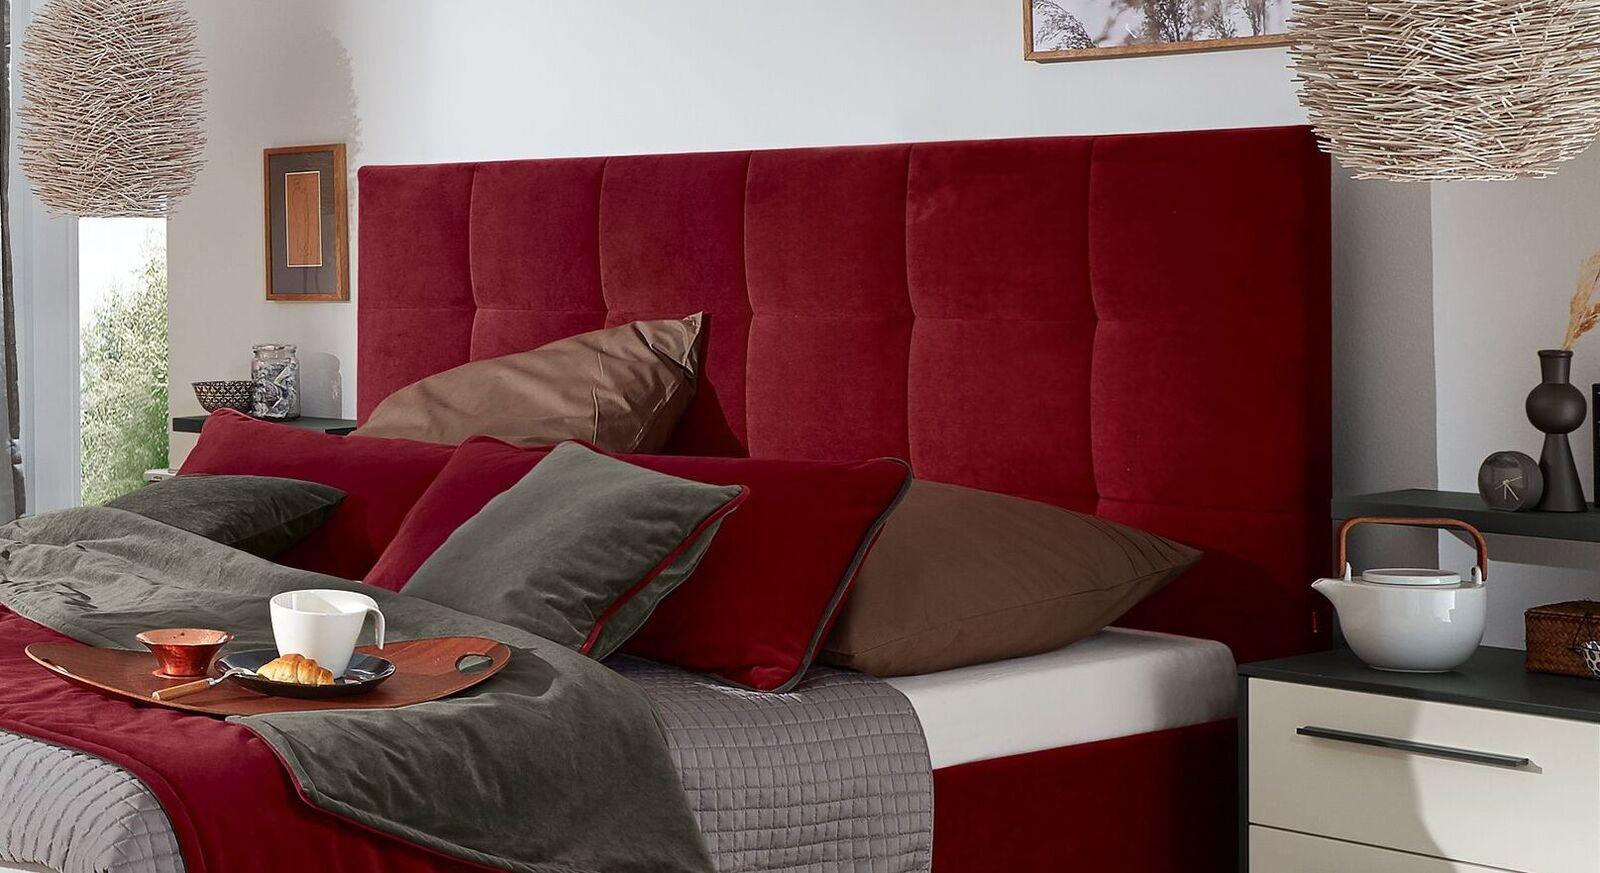 Bequemes MUSTERRING Bett Epos mit Kopfteil in Quadratsteppung